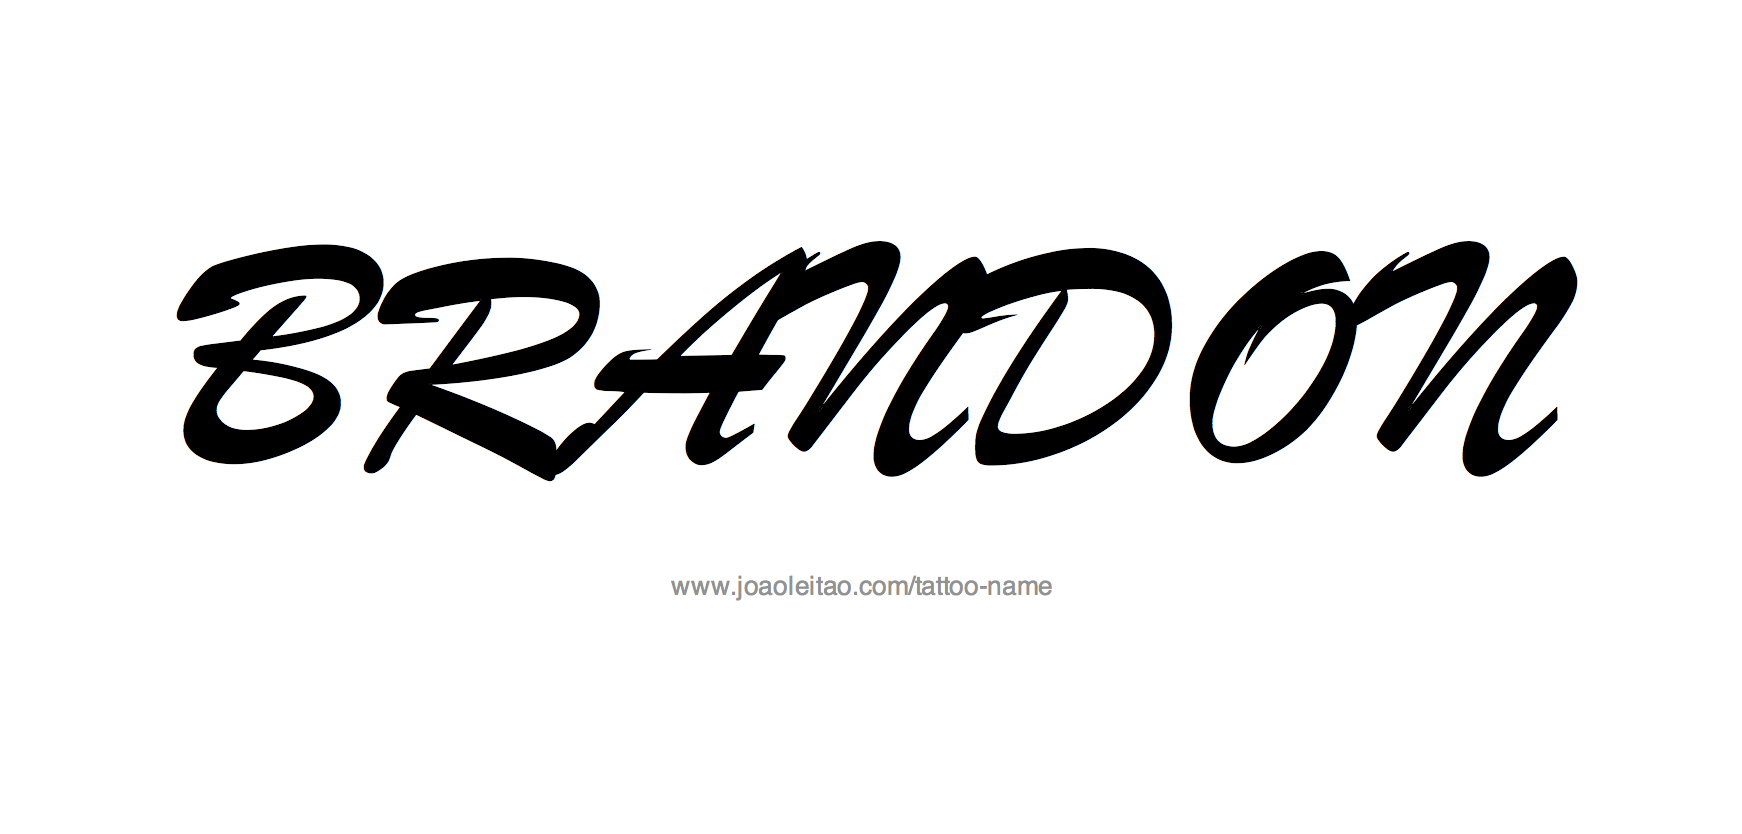 brandon name tattoo designs